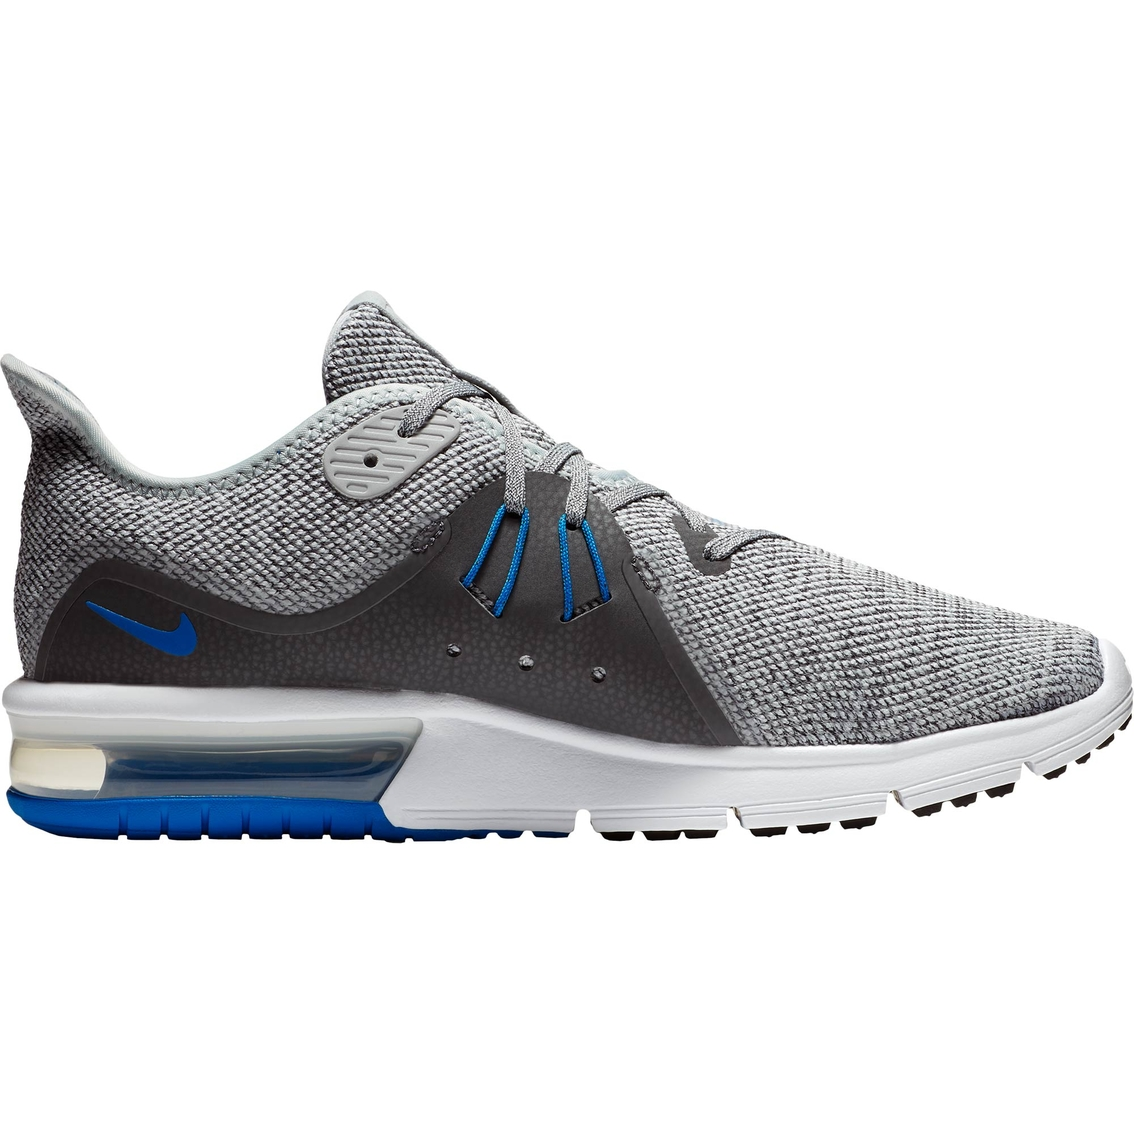 e190edf0bd6f Nike Men s Air Max Sequent 3 Running Shoes